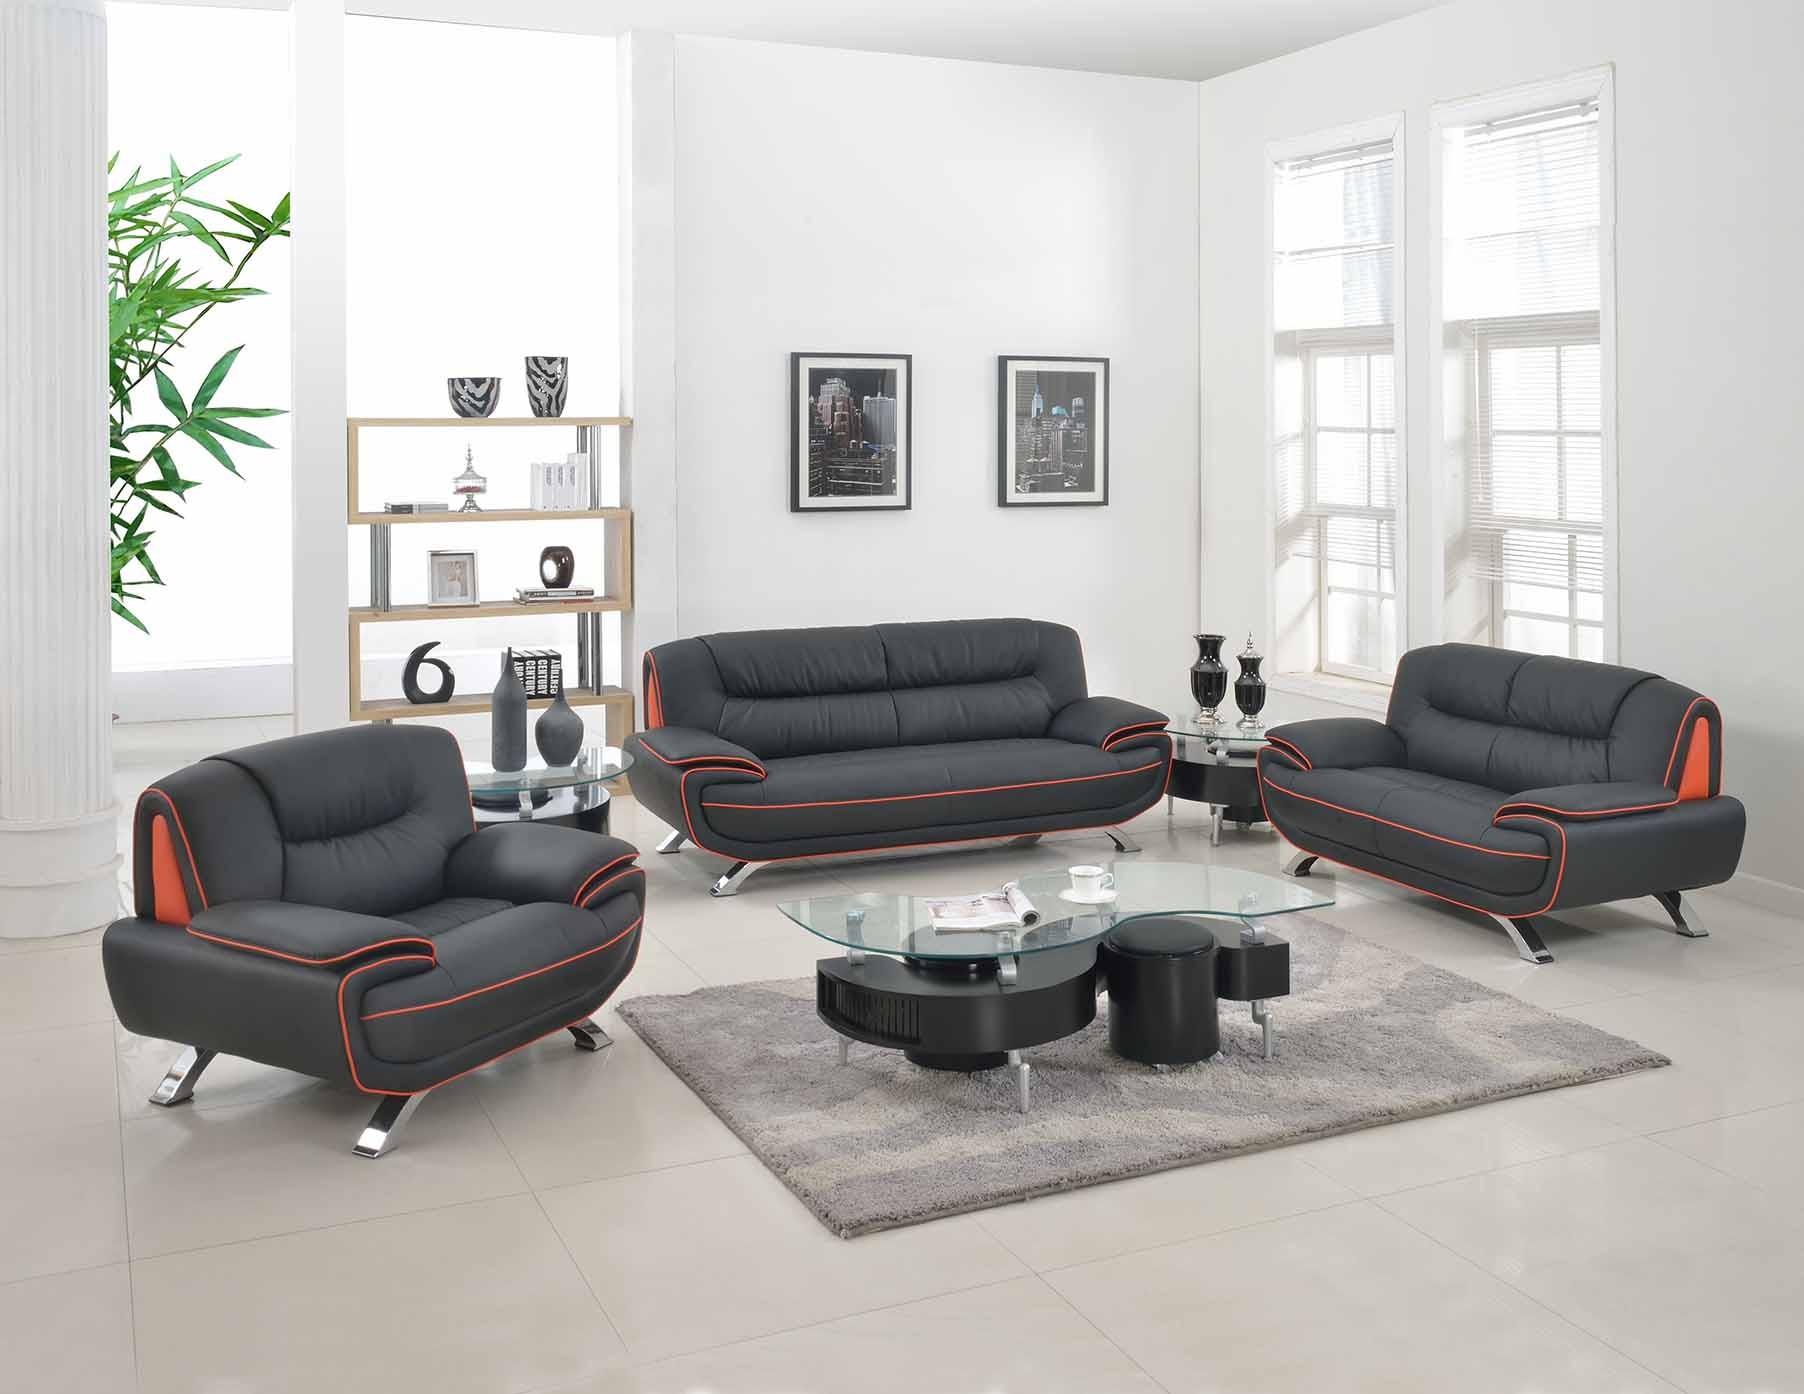 504 Modern Italian Leather Sofa Set Grey - Leather Sofa ...